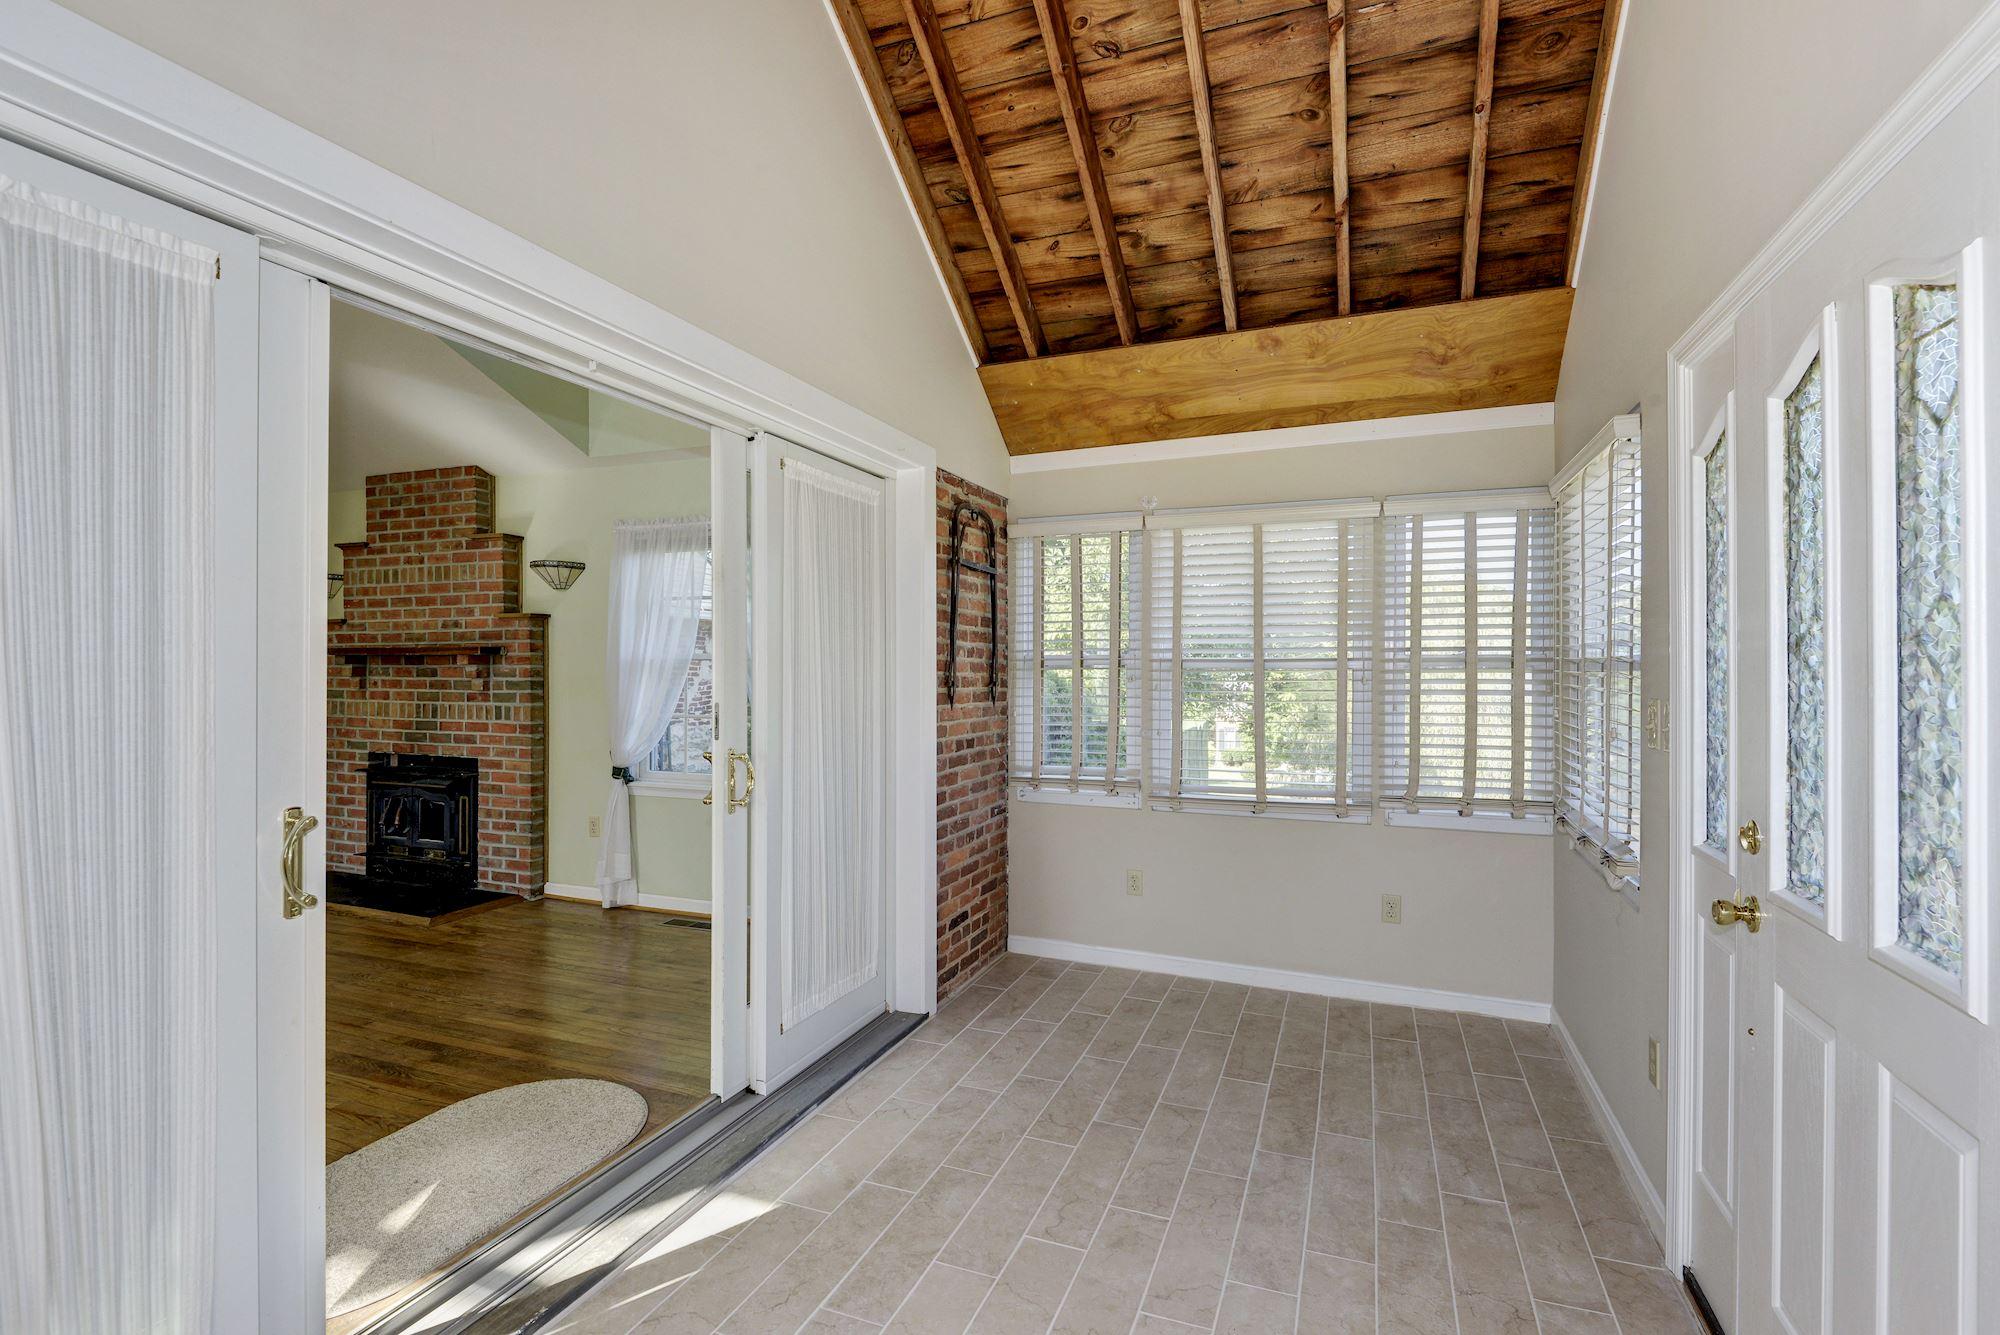 House Foyer Xl : Burgundy ln clarksville md